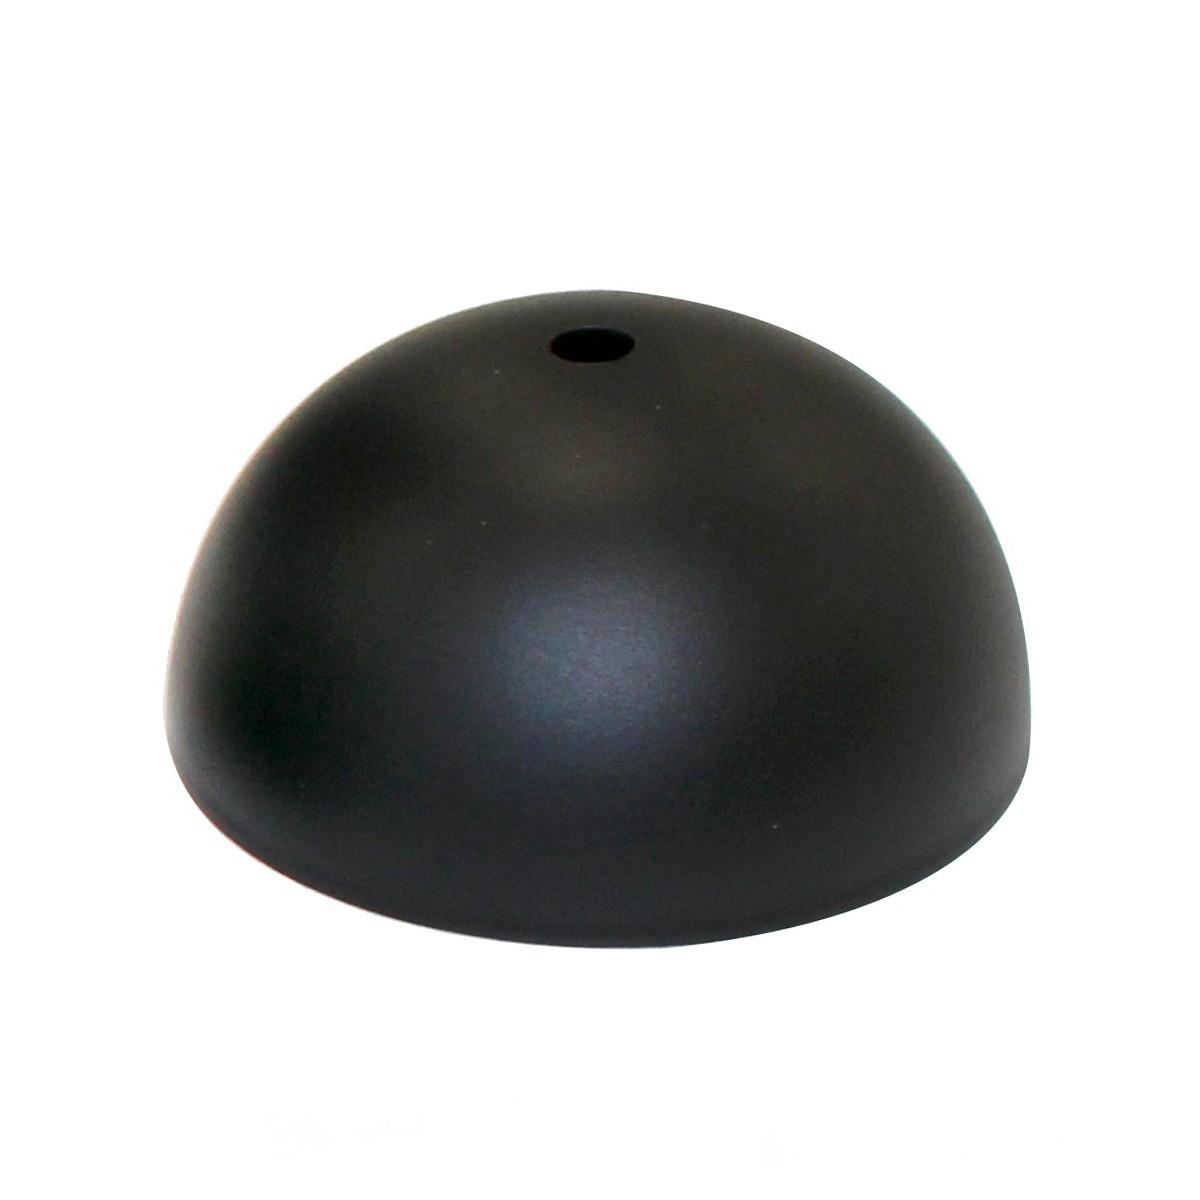 Media bola construct negro Make it